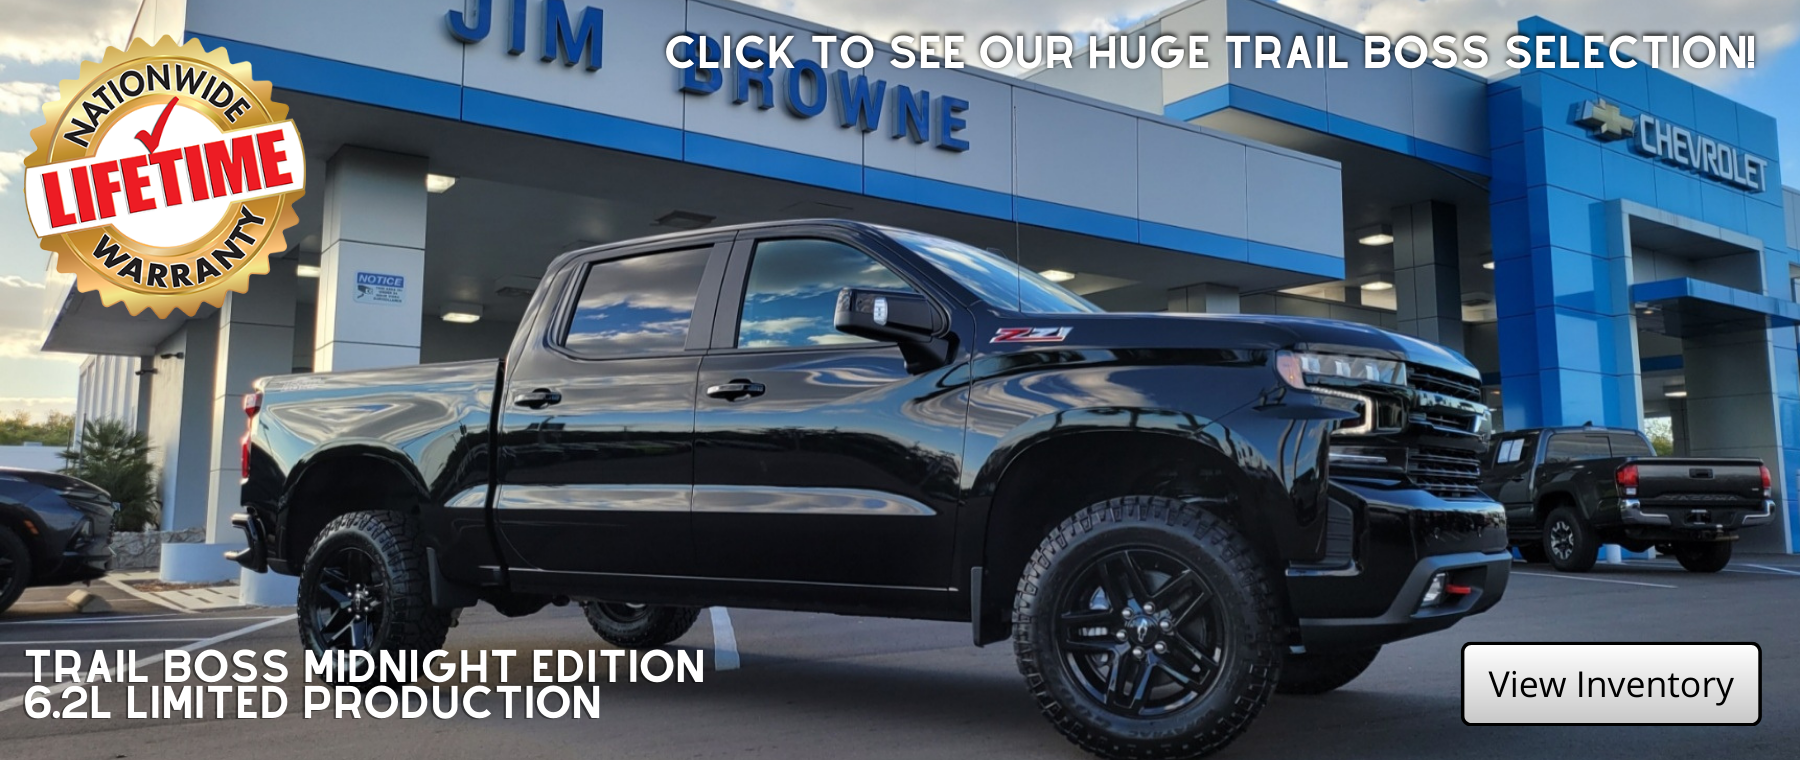 Jim Browne Chevrolet Inc New Chevy Used Car Dealership Tampa Fl